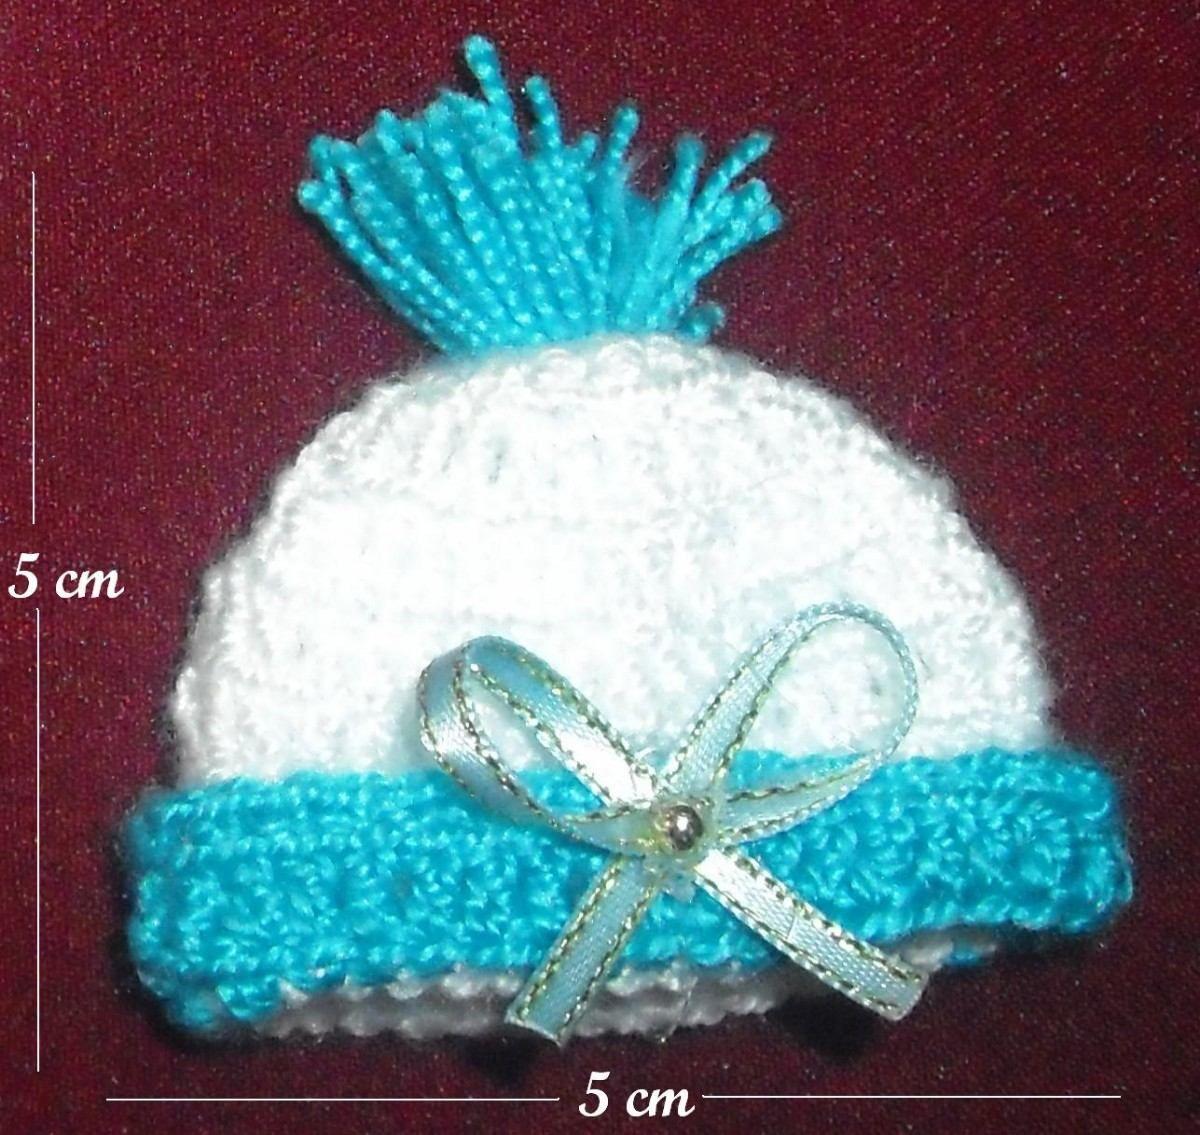 Encintados Para Baby Shower Nina.Crochet Recuerditos Recuerditos Recuerdos Para Baby Shower